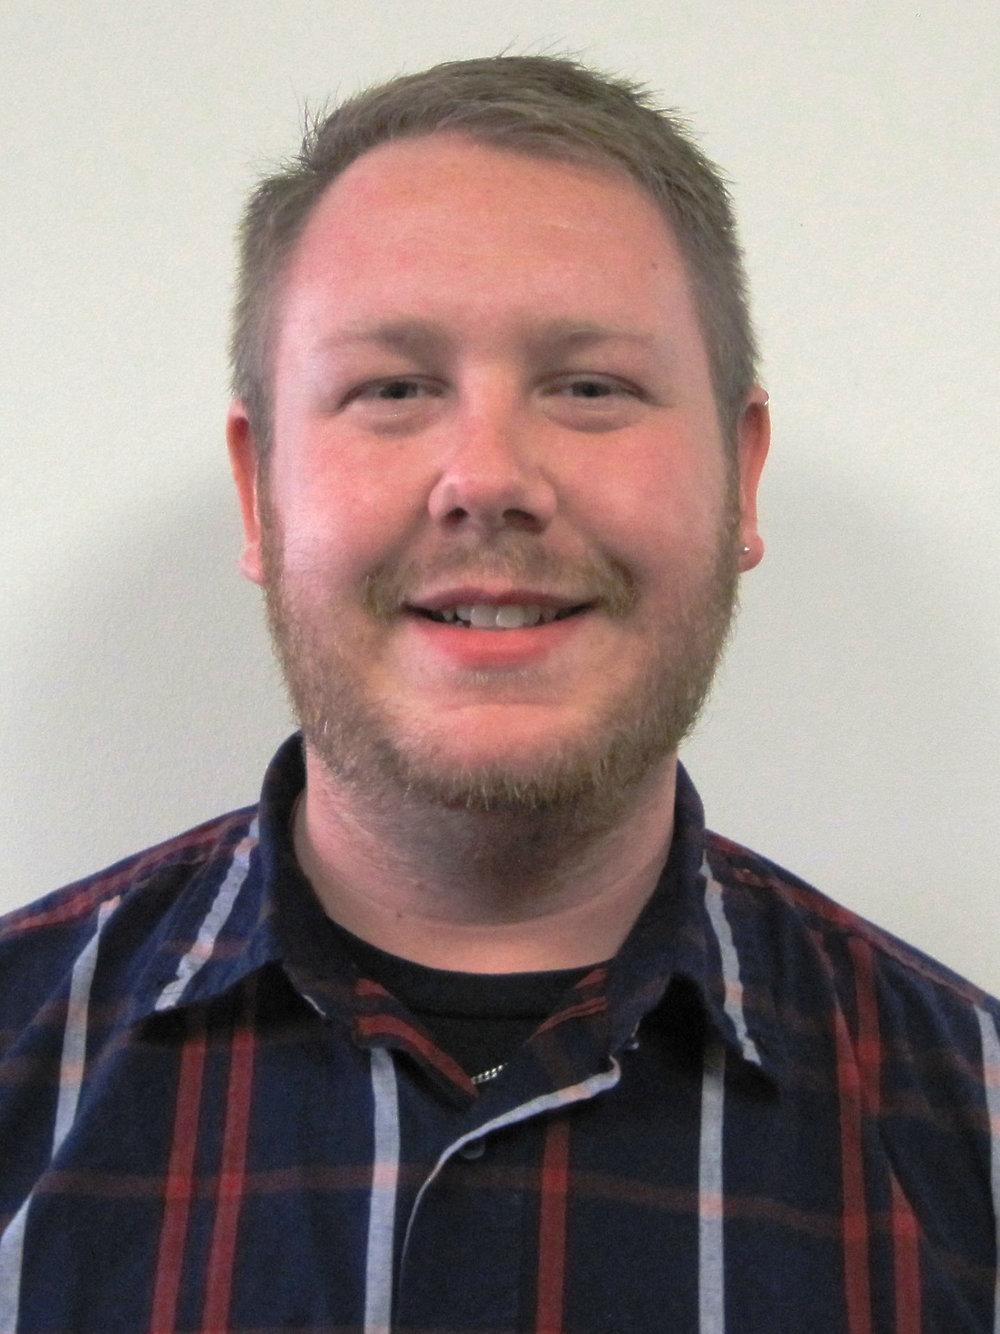 Matt Uppman, LINC Site Coordinator, Whittier Elementary